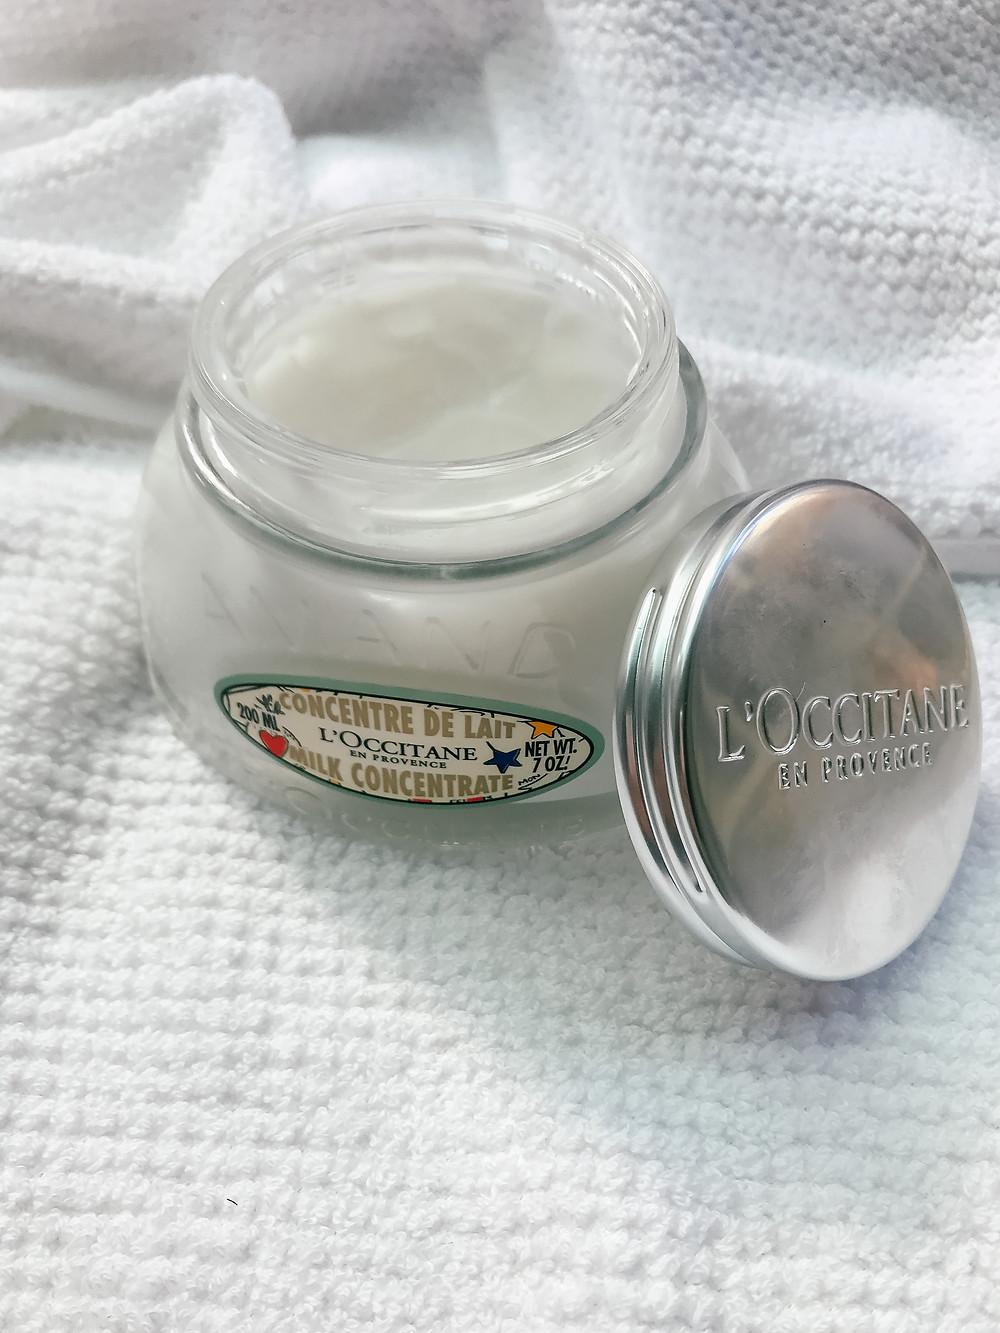 L'Occitane Almond Milk Concentrate l November Favorites 2018 l Bath & Body Products l Beauty l A Style Alike